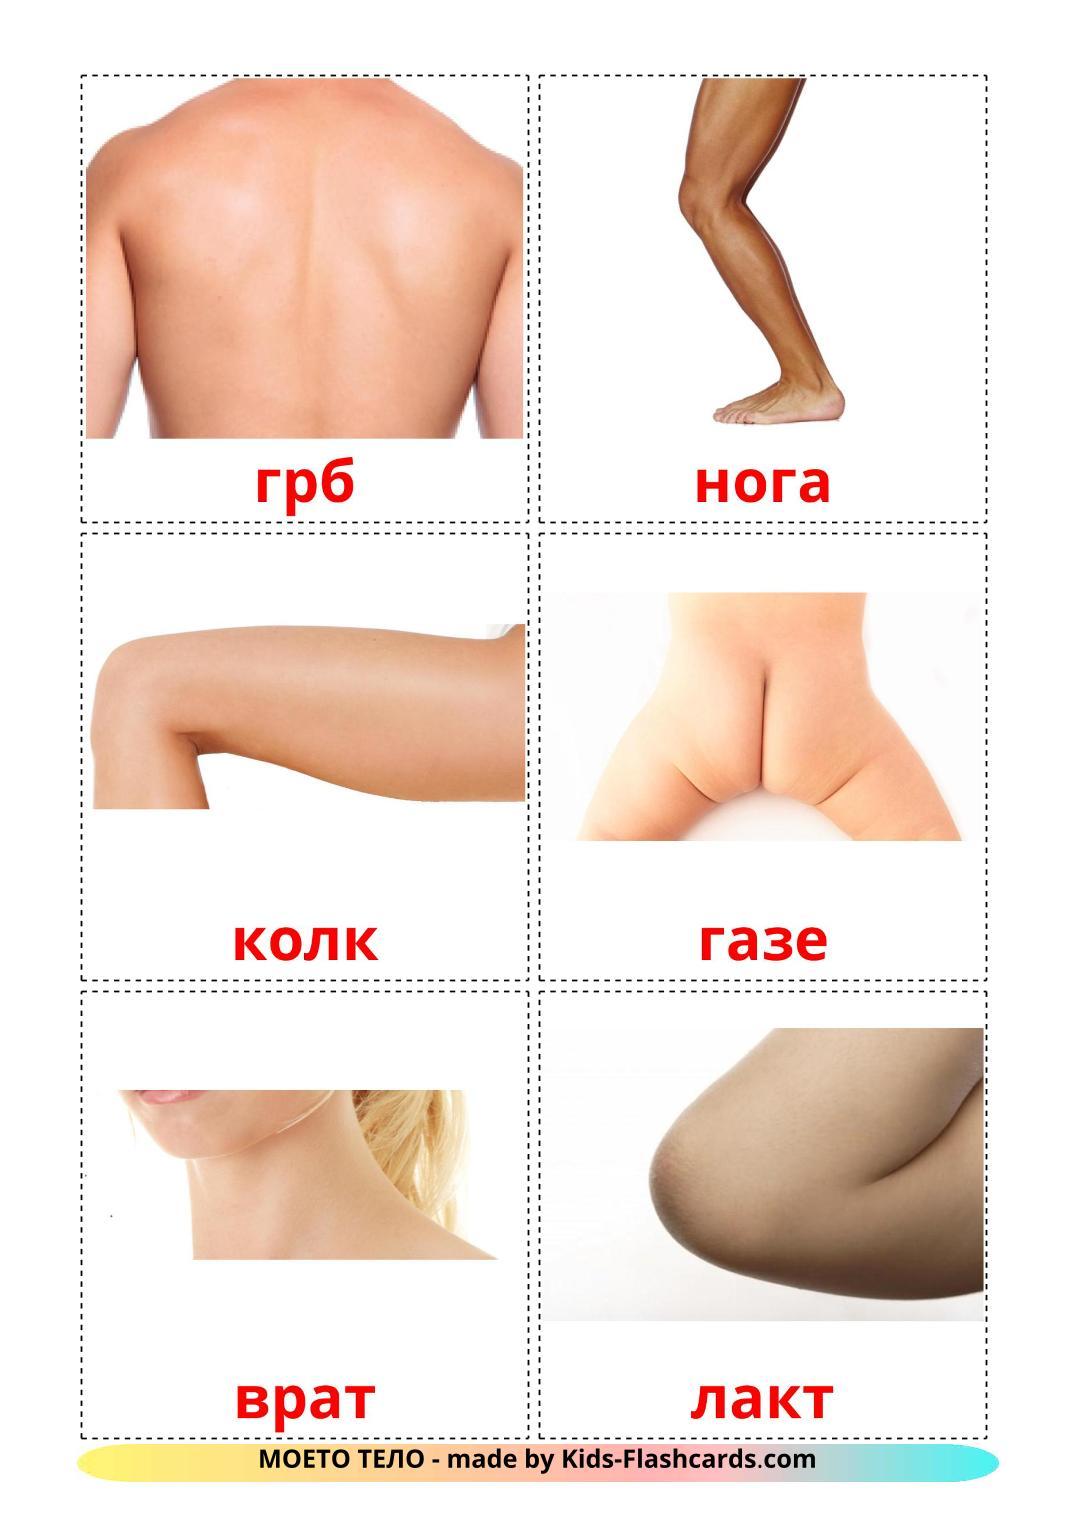 Body Parts - 26 Free Printable macedonian Flashcards